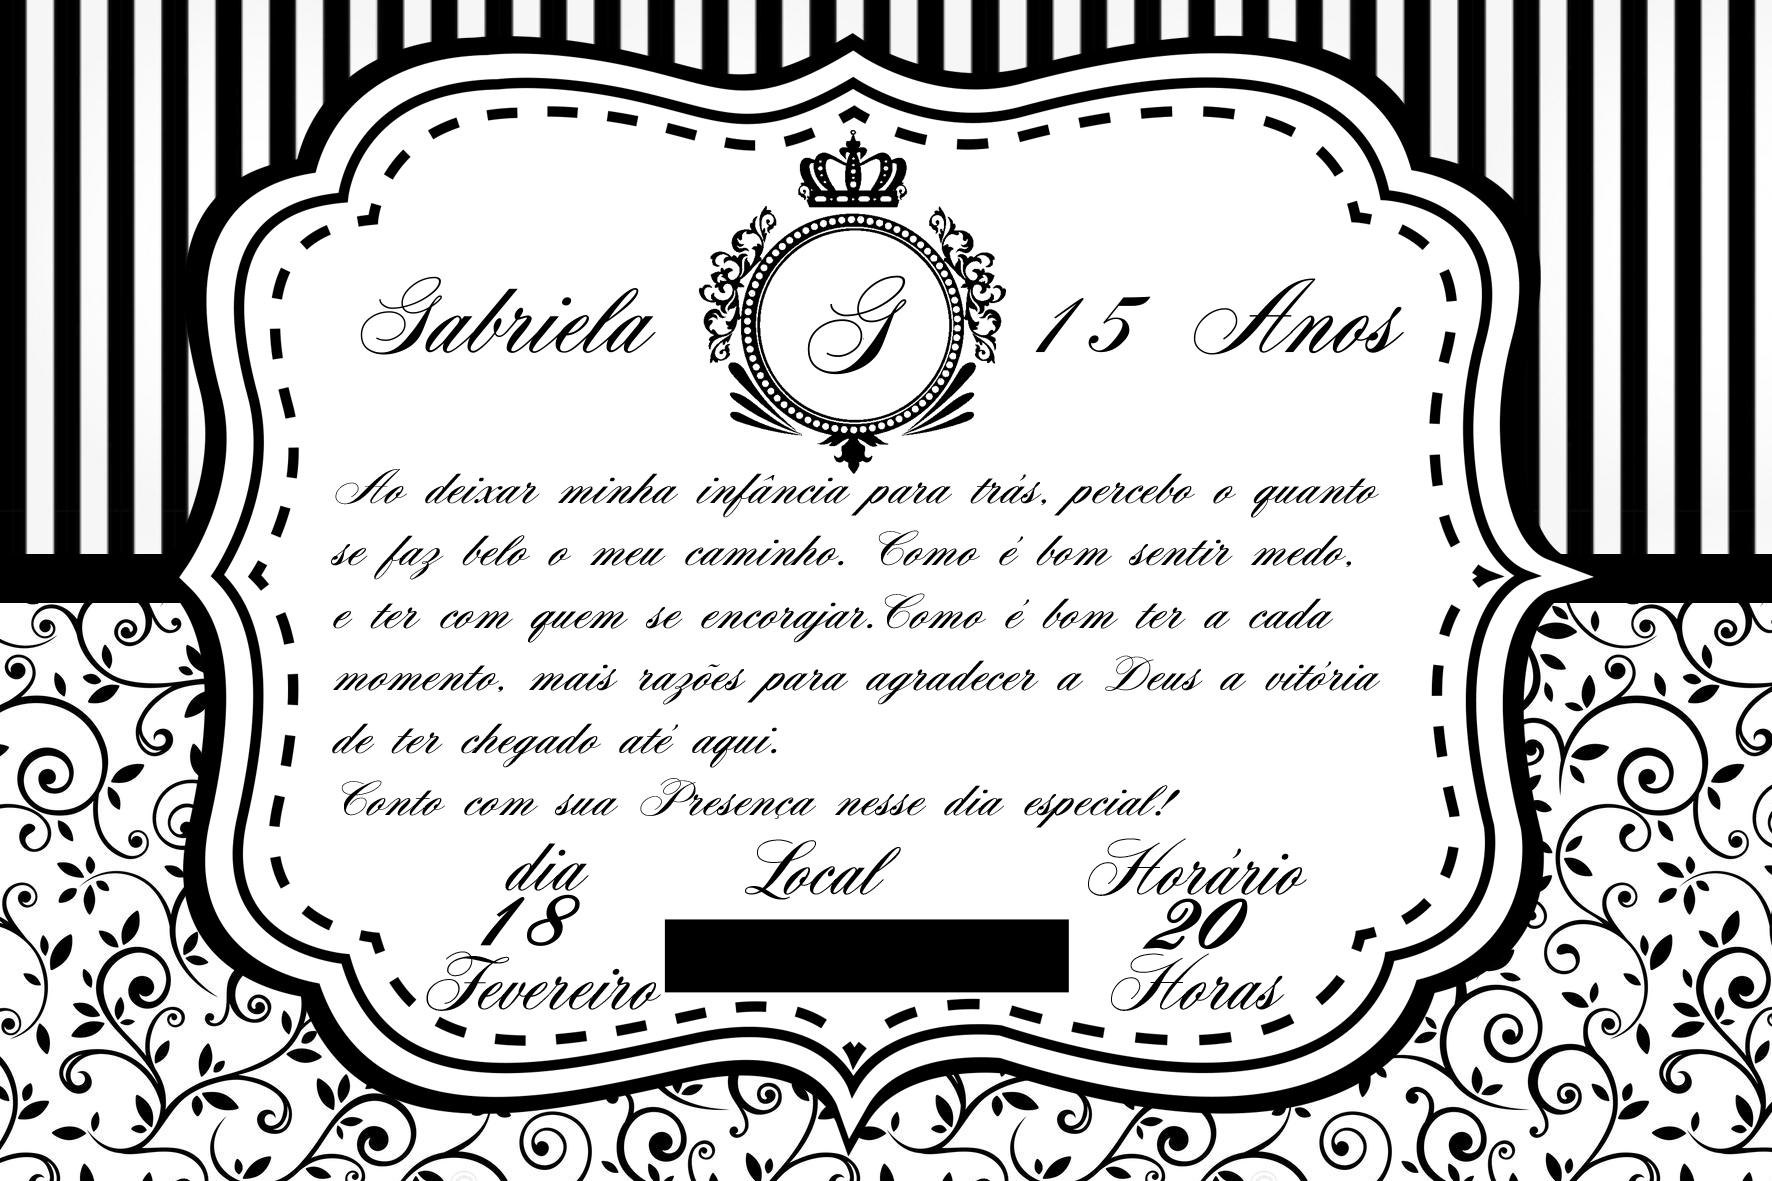 Convite De Aniversário Branco Preto E Dourado Elo7